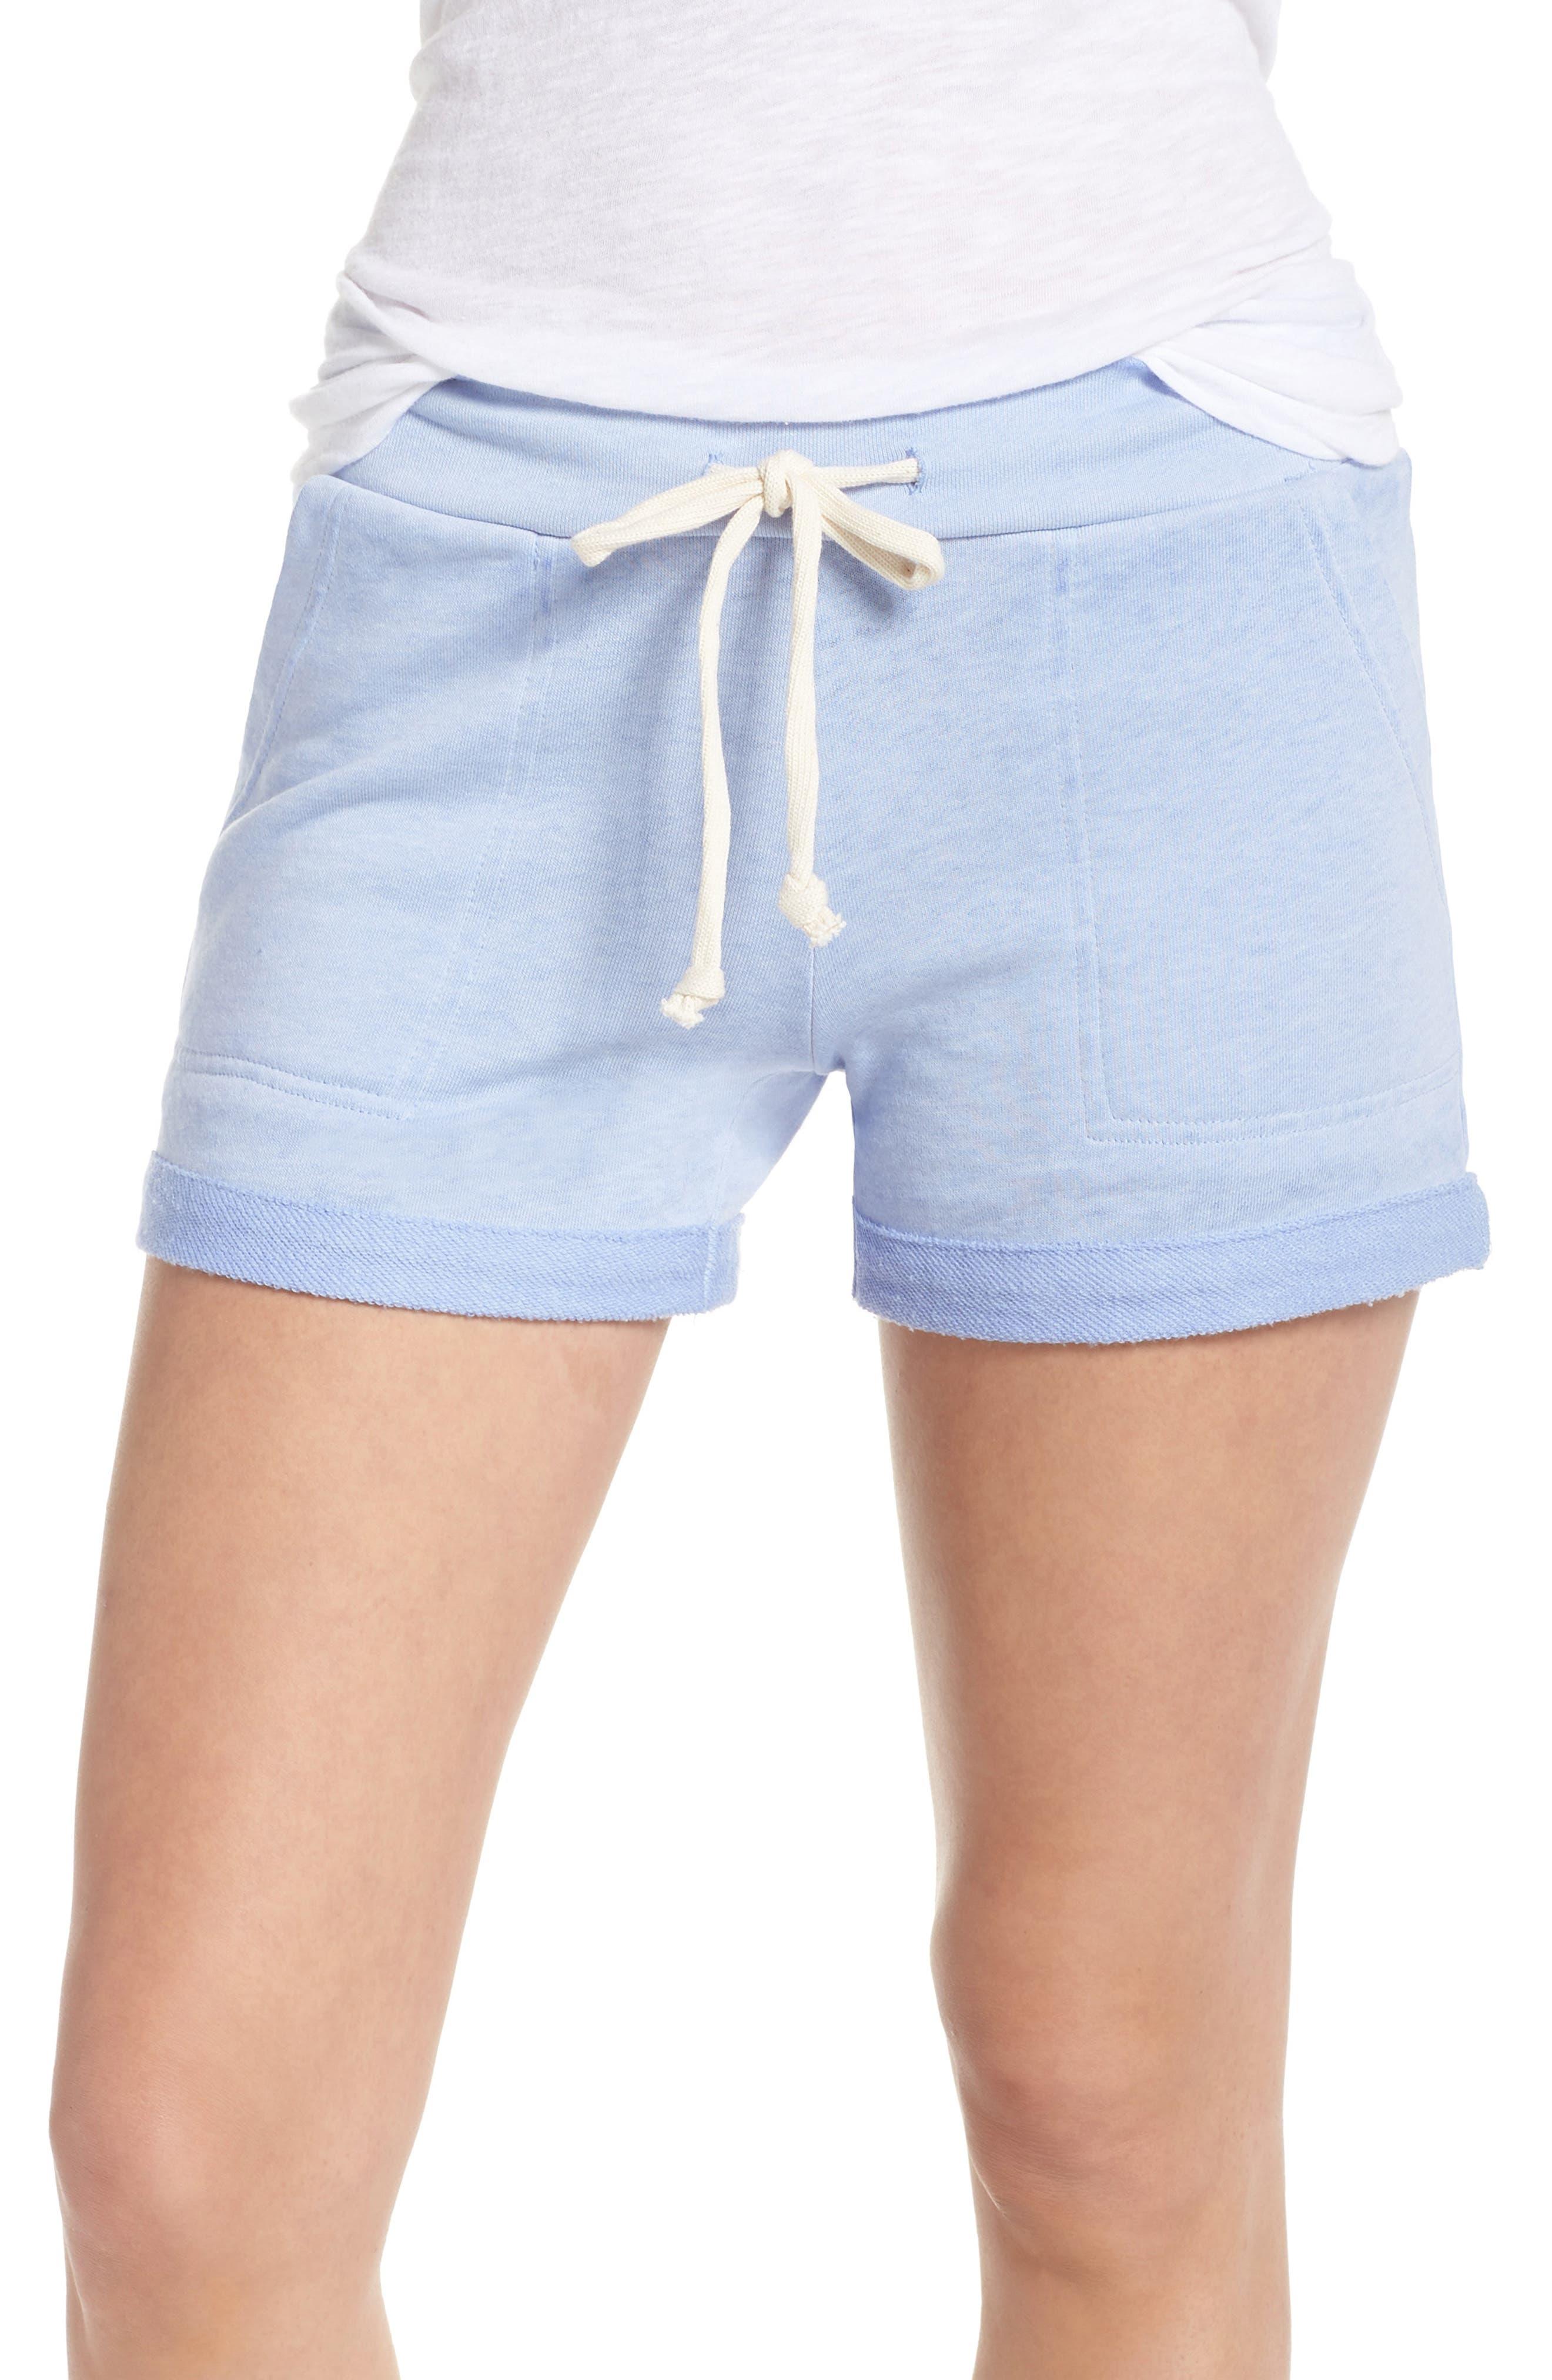 Lounge Shorts,                             Main thumbnail 1, color,                             Lavender Lustre